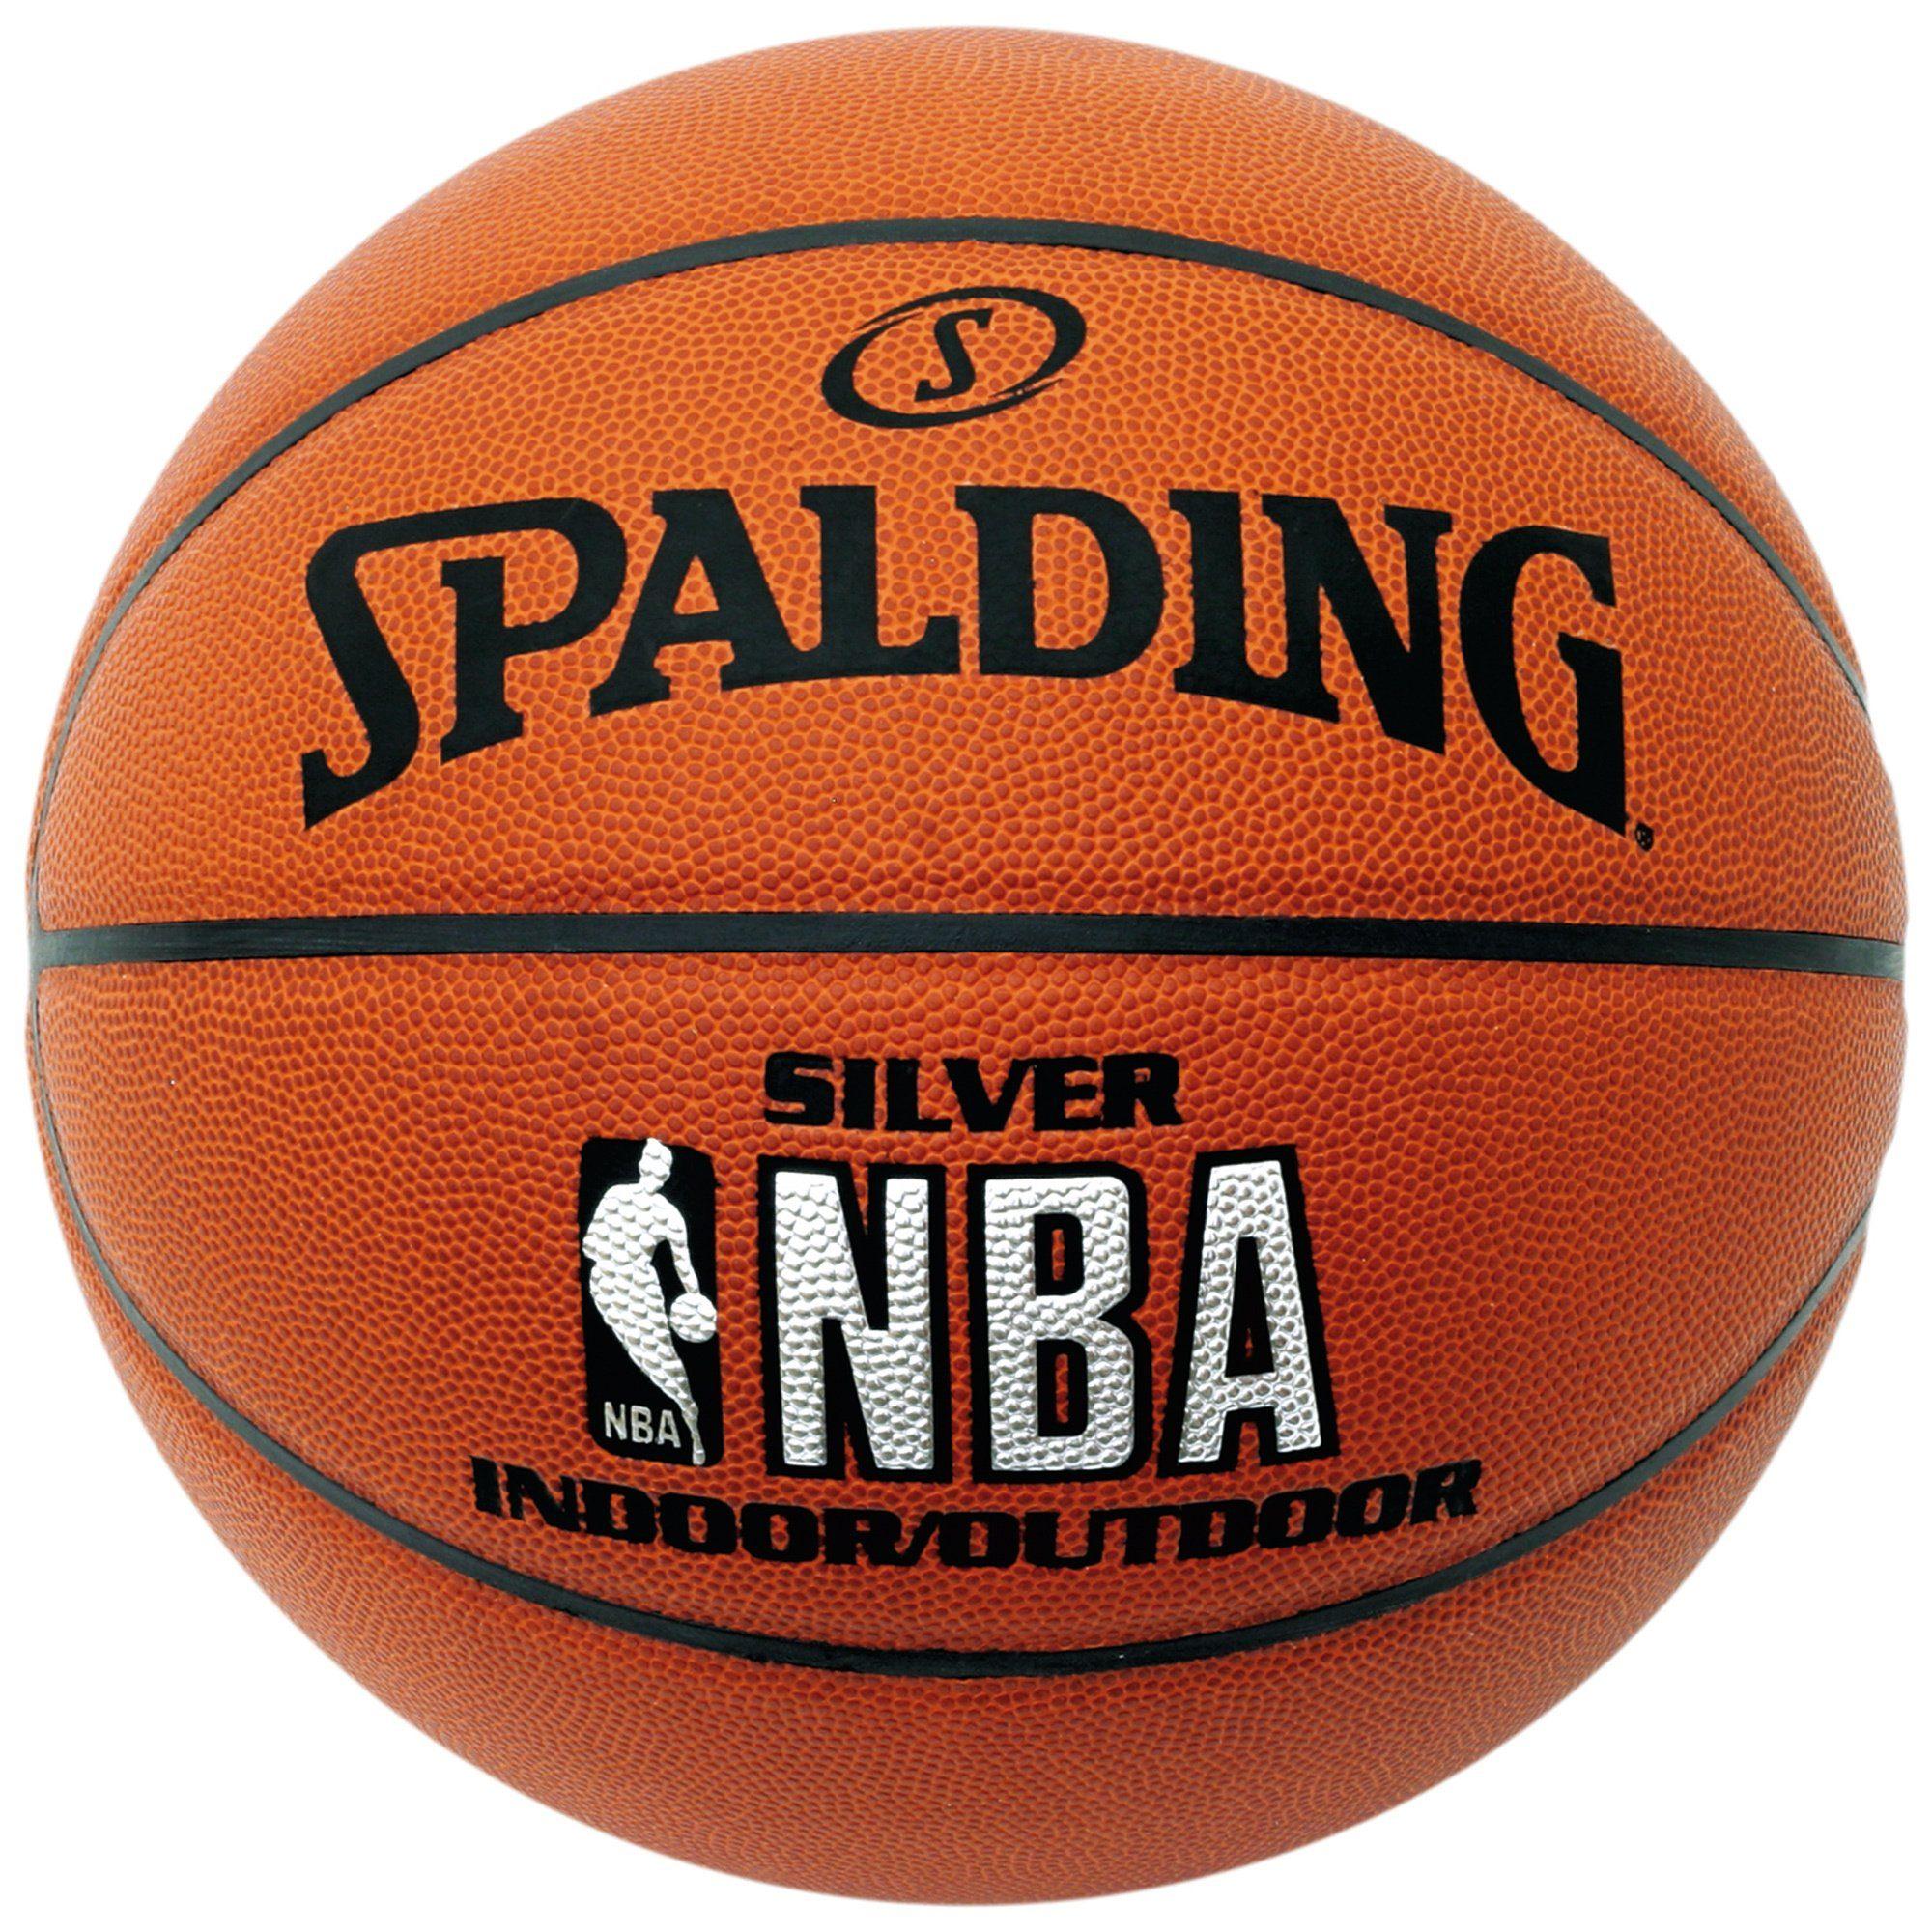 SPALDING Silver Basketball